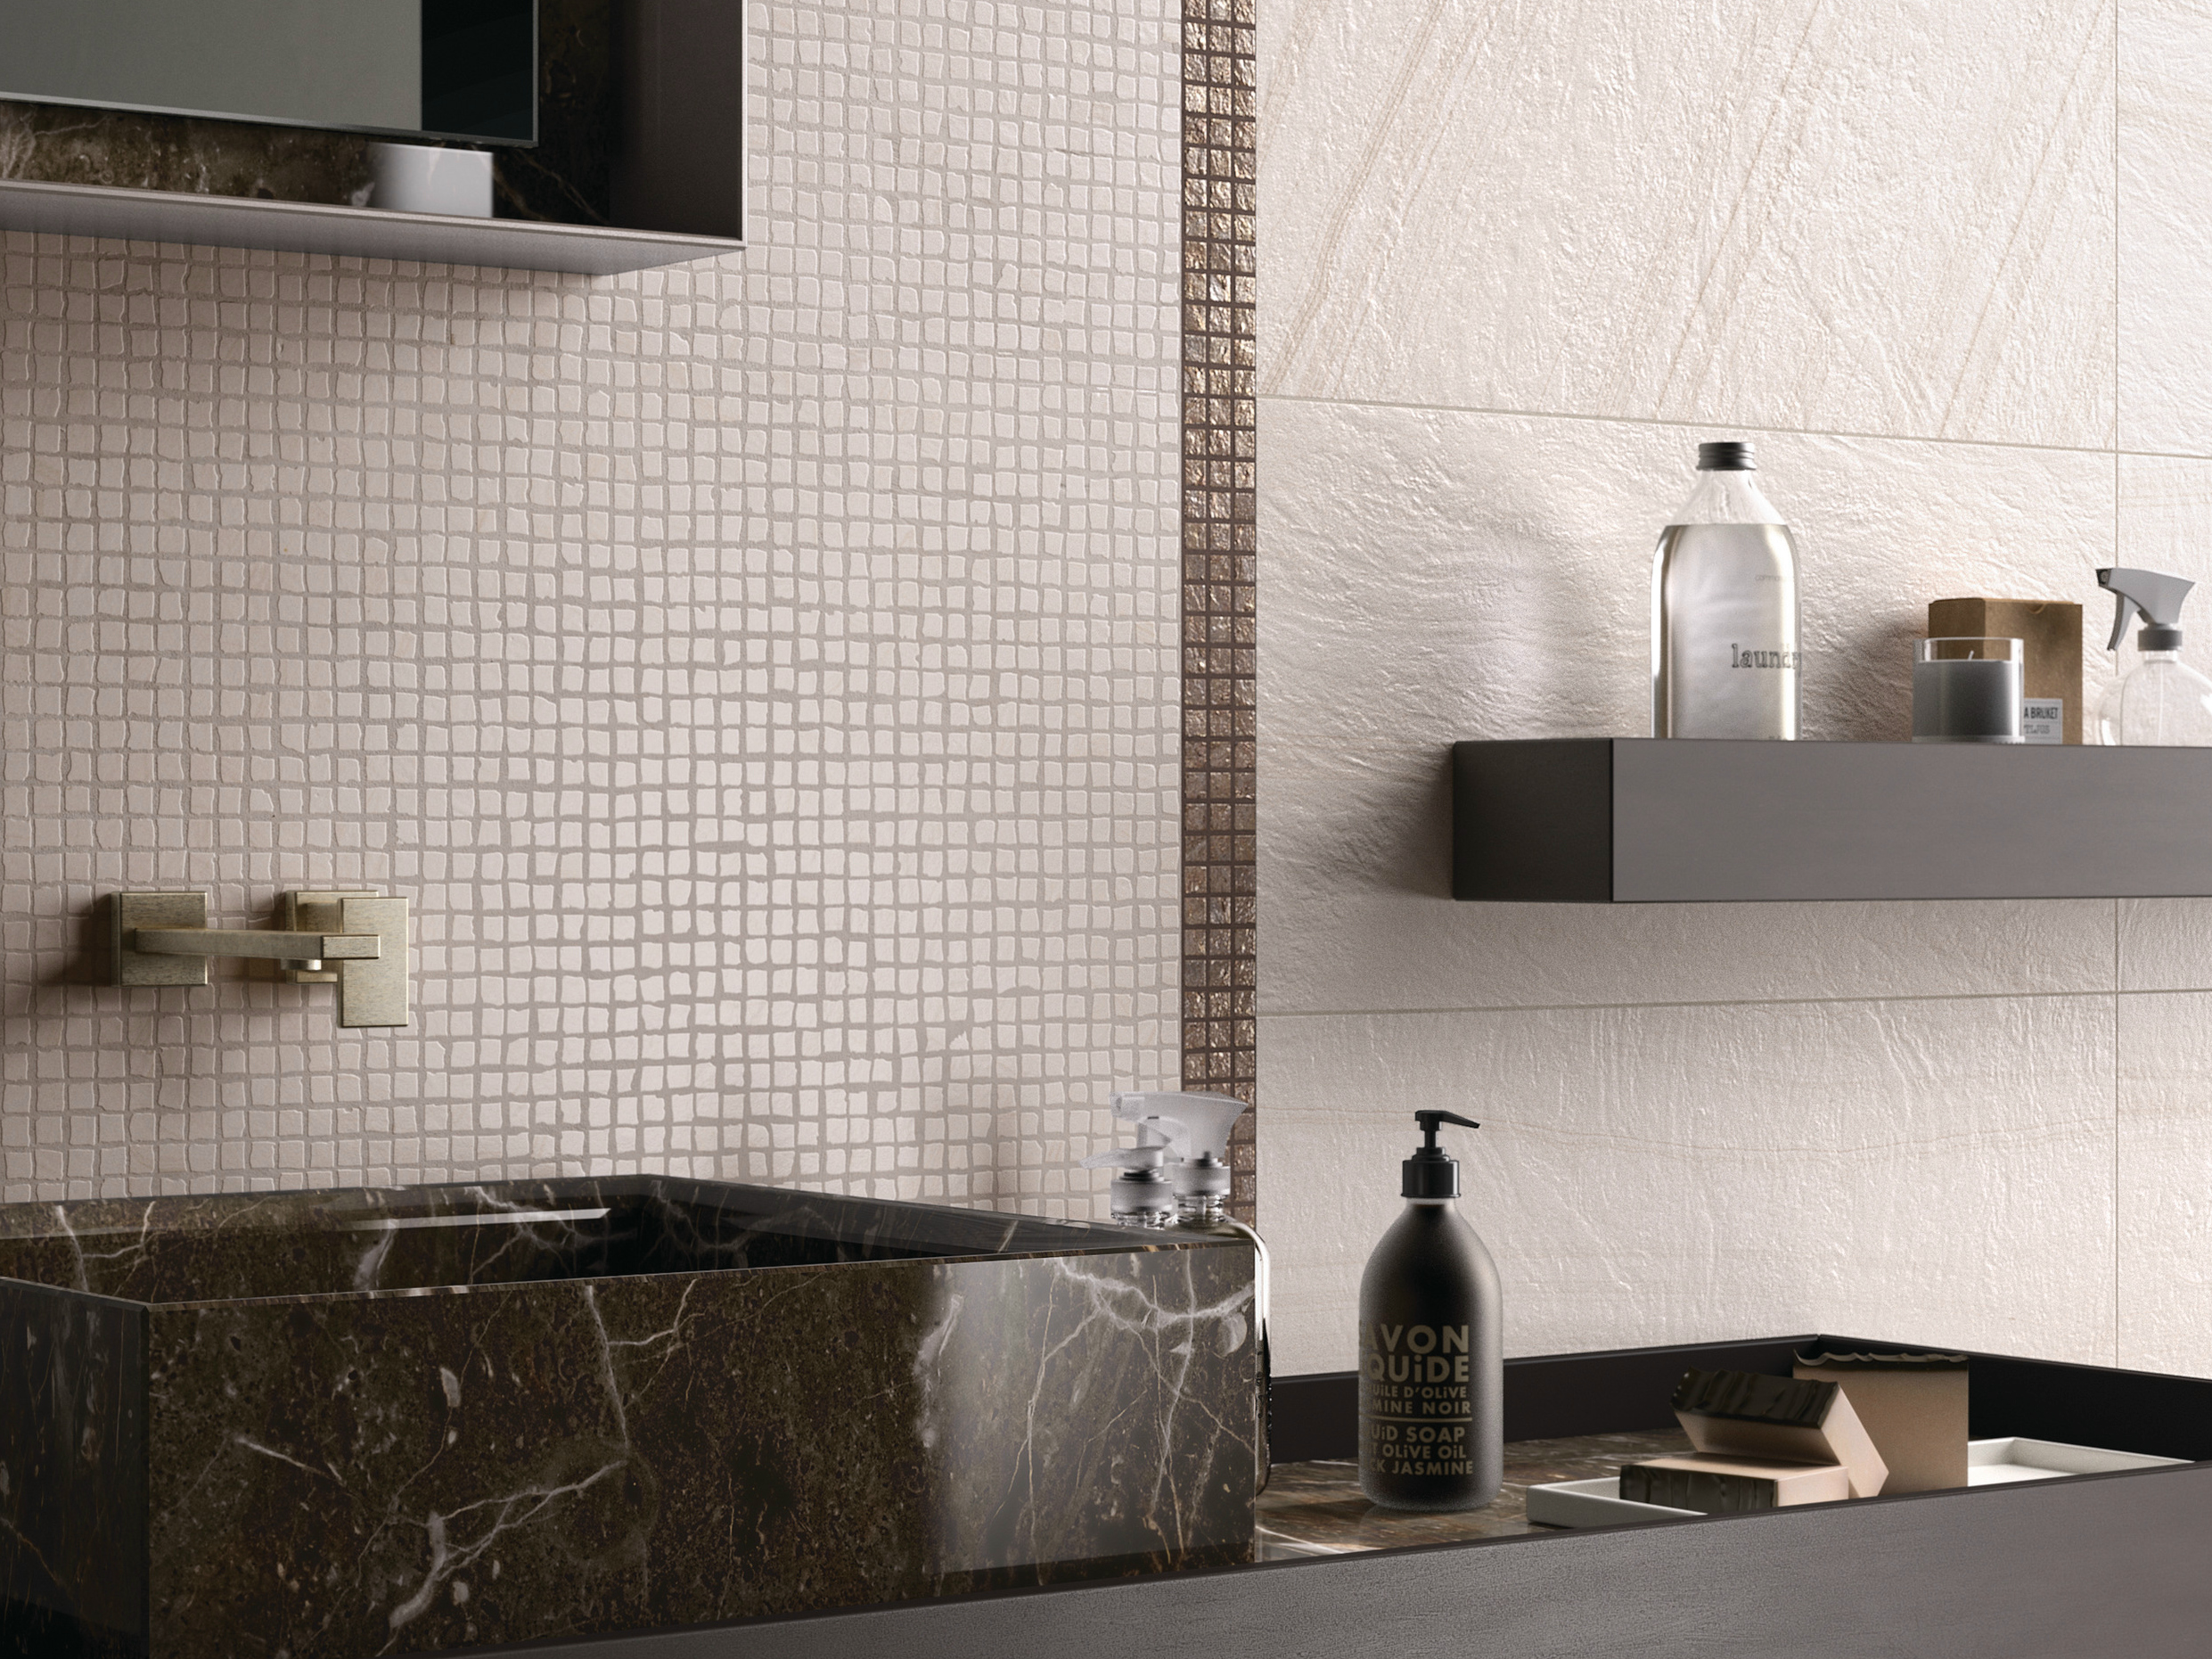 rev tement de sol mur en gr s c rame re work collection re work by abk industrie ceramiche. Black Bedroom Furniture Sets. Home Design Ideas